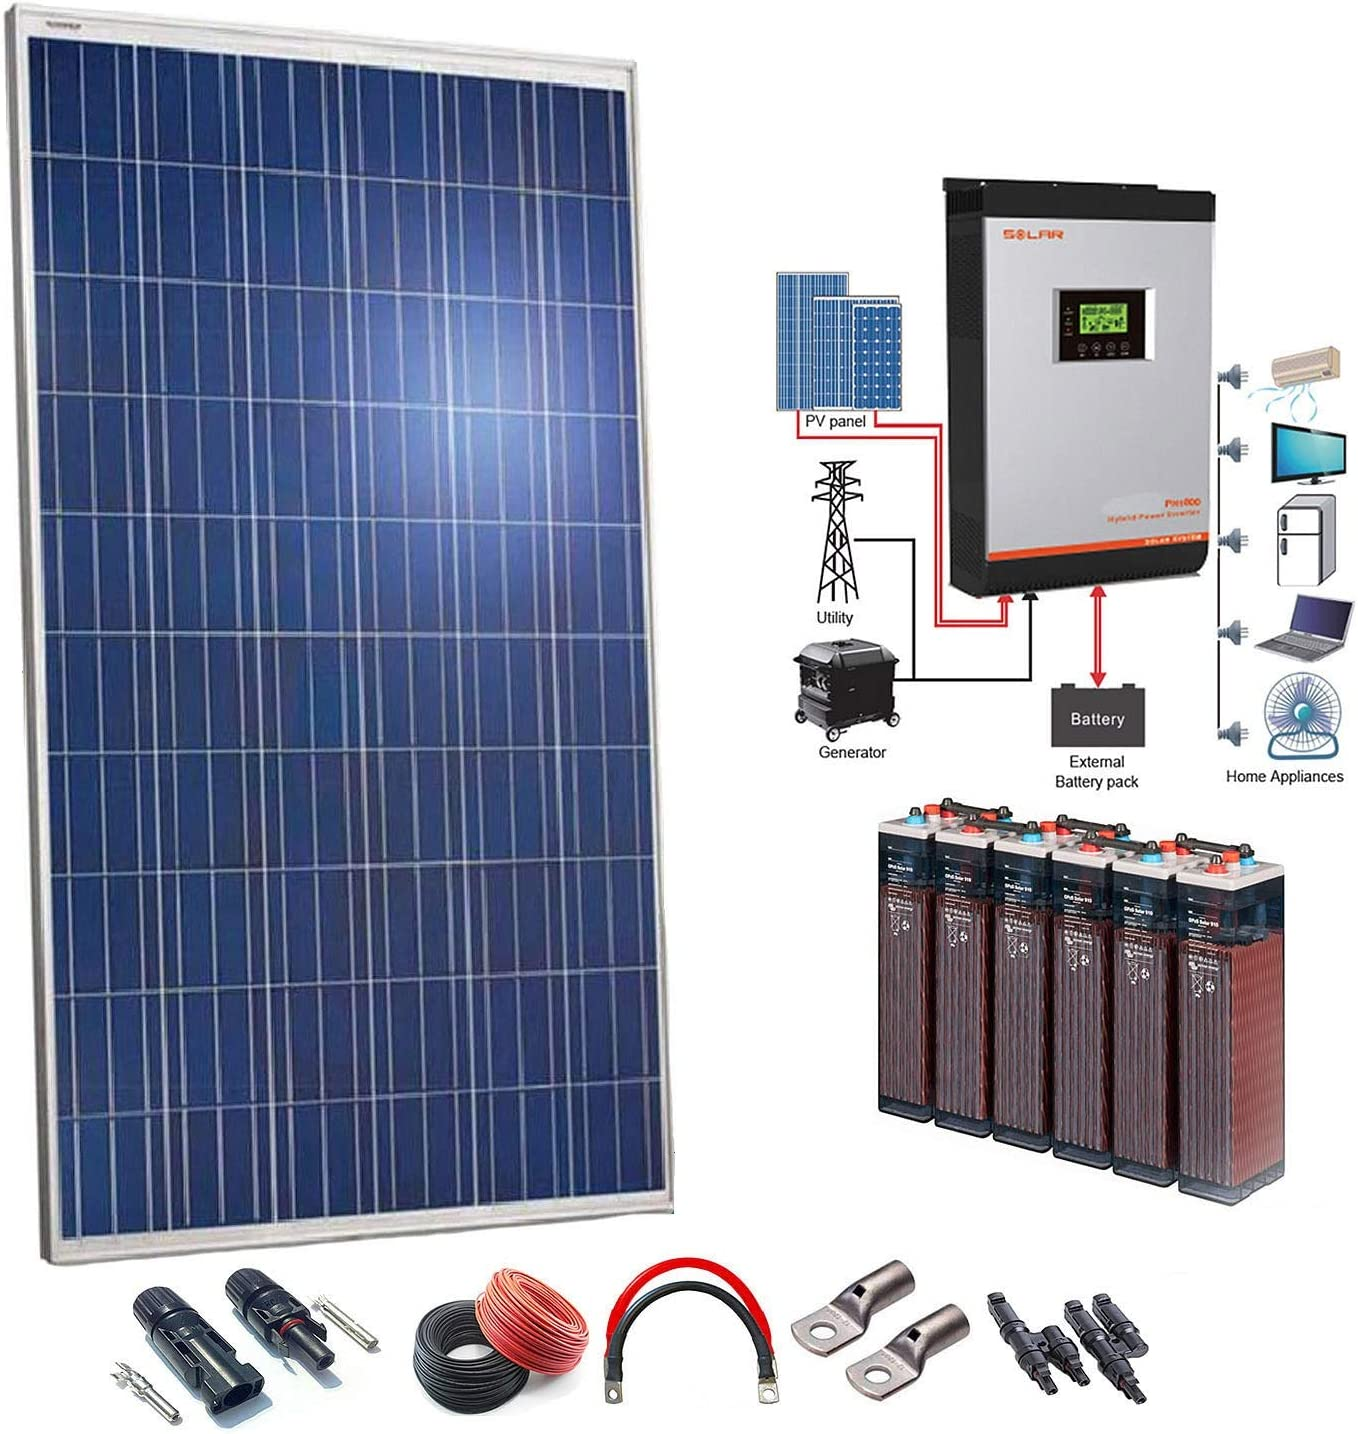 Kit Solar 24v 2500w/12500w día Batería 6OPzS 900Ah Inversor Multifunción 5kva Regulador MPPT 80A